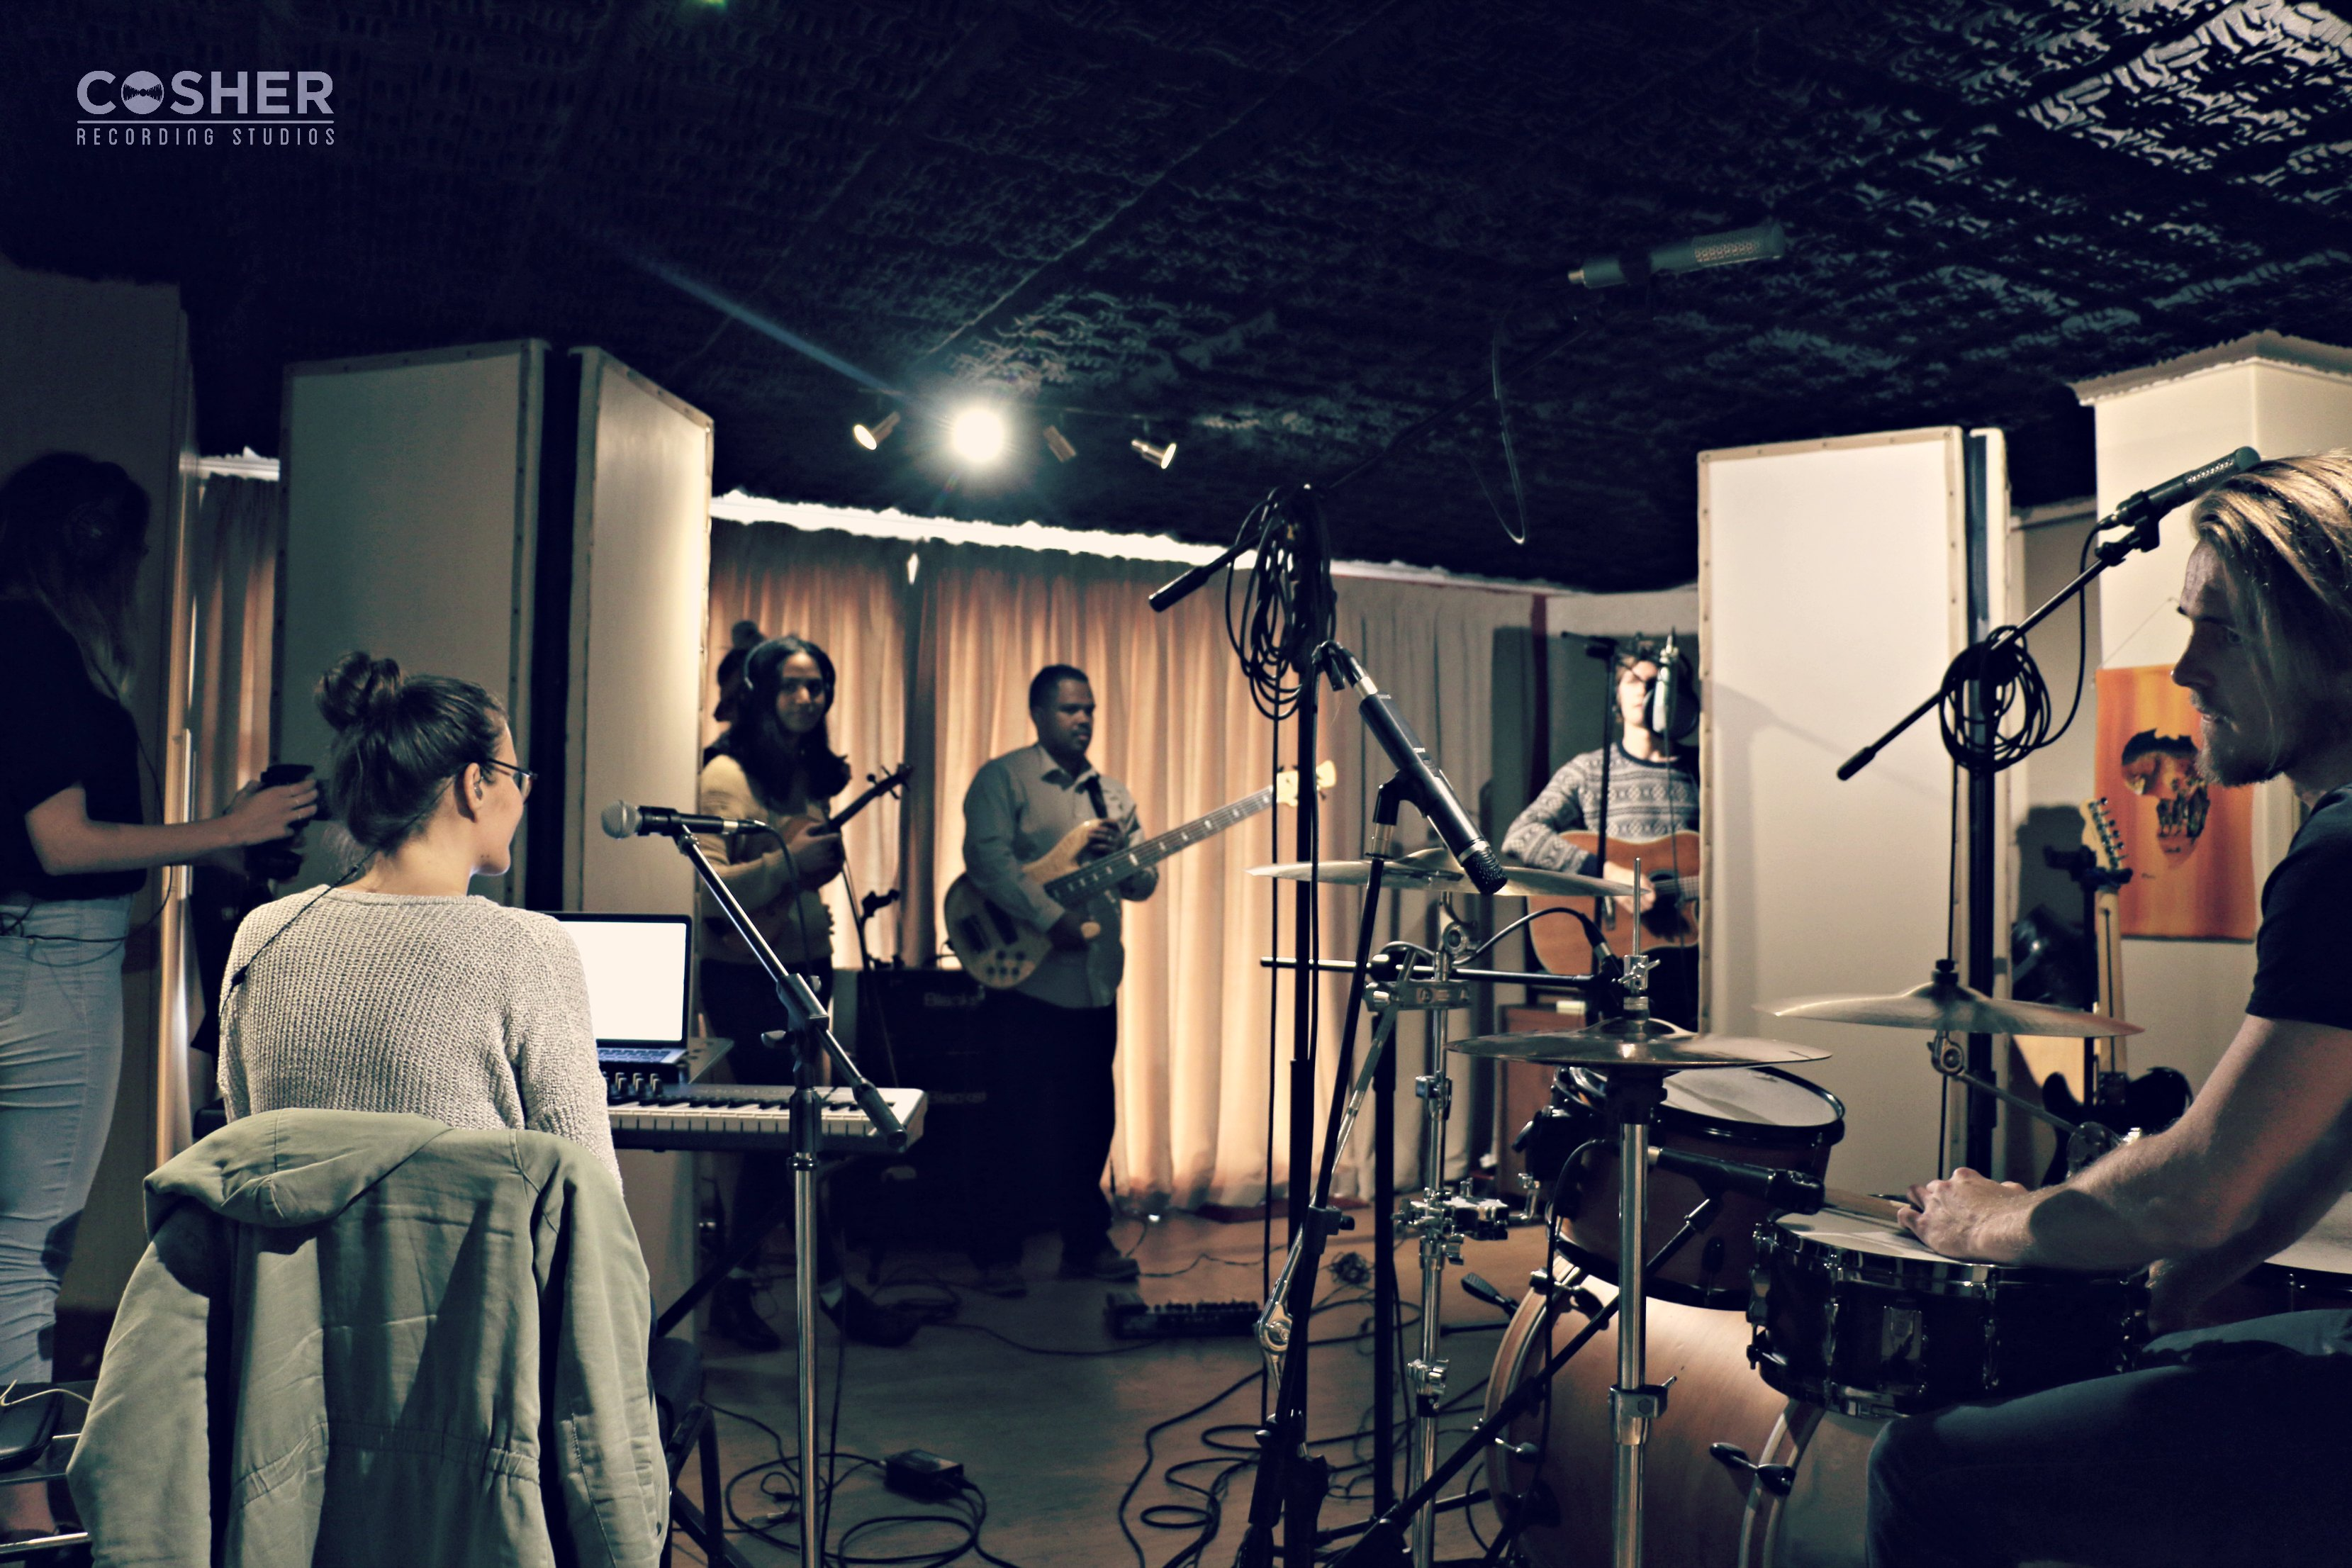 Oddo Bam at Cosher Recording Studios